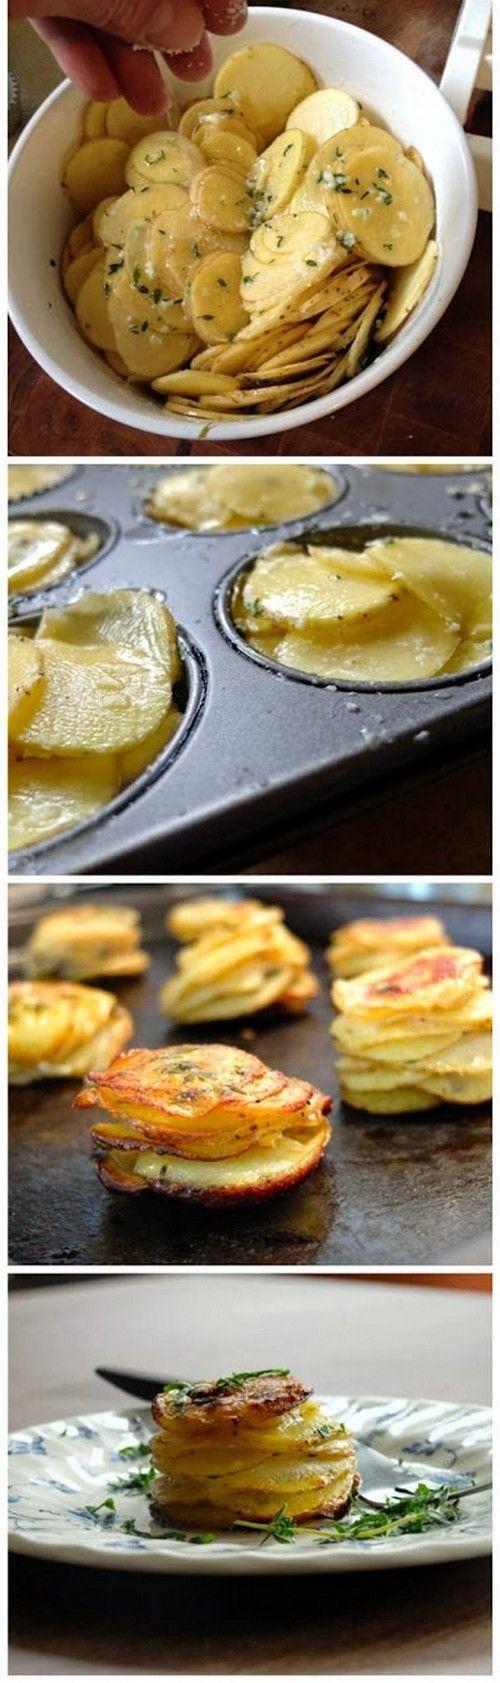 L'il Pomme Anna.It's a very simple deconstruction of that classic casserole potato dish Pomme Anna, but with a single-serve attitude.